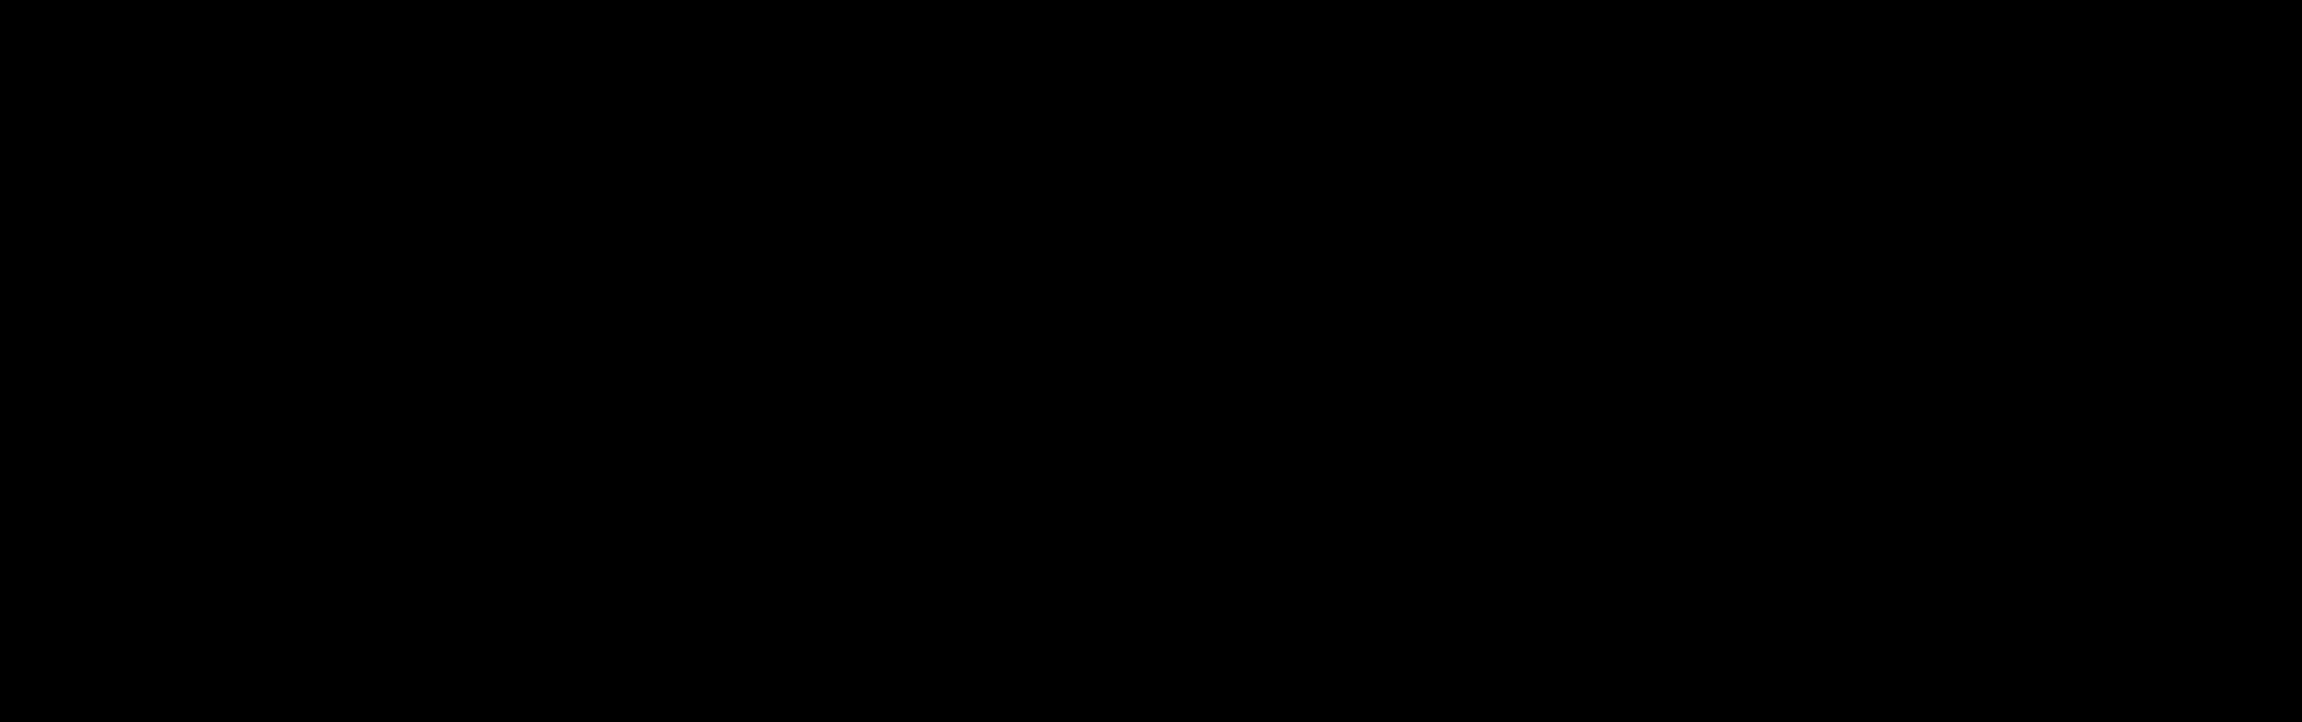 6-(6-Chloro-1,2,3,4-tetrahydroacridin-9-ylamino)hexanoic acid [2-(1H-indol-3-yl)ethyl]amide